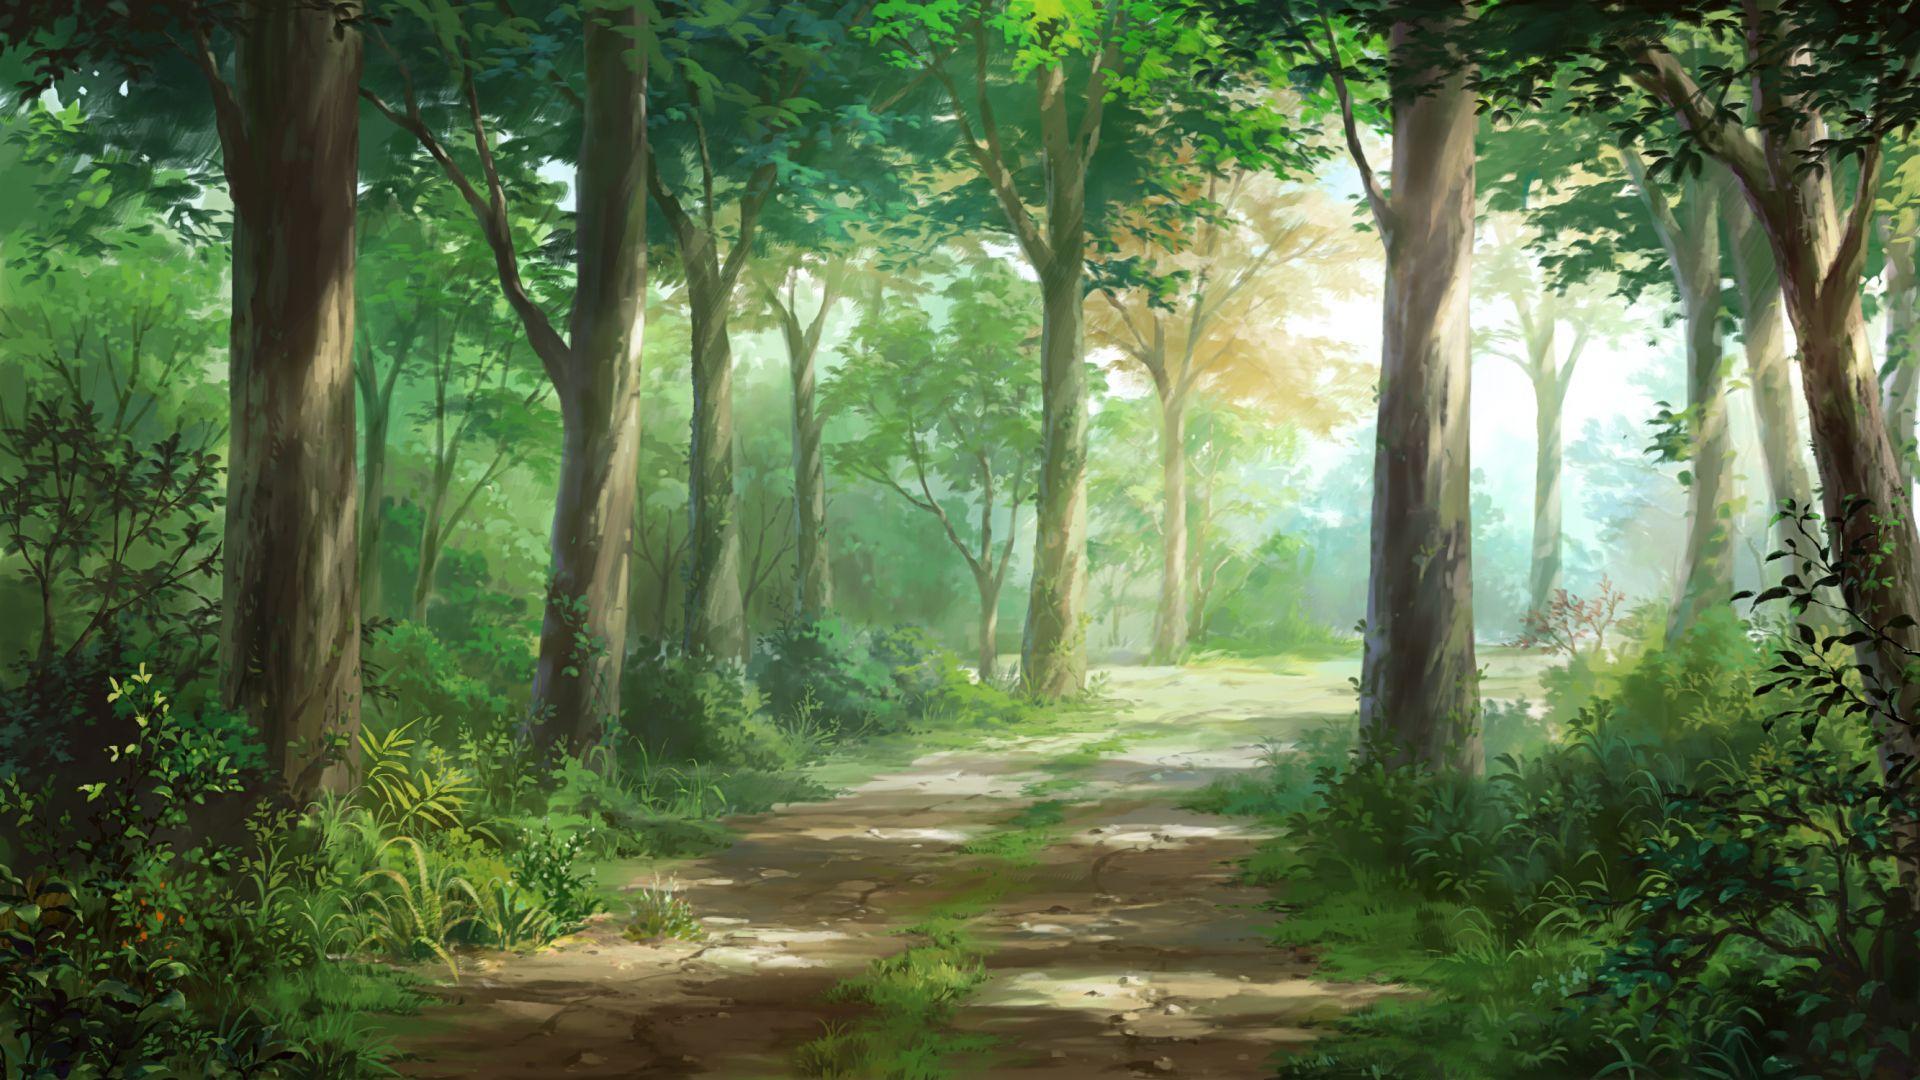 Desktop Wallpaper Anime Original Road Forest Hd Image